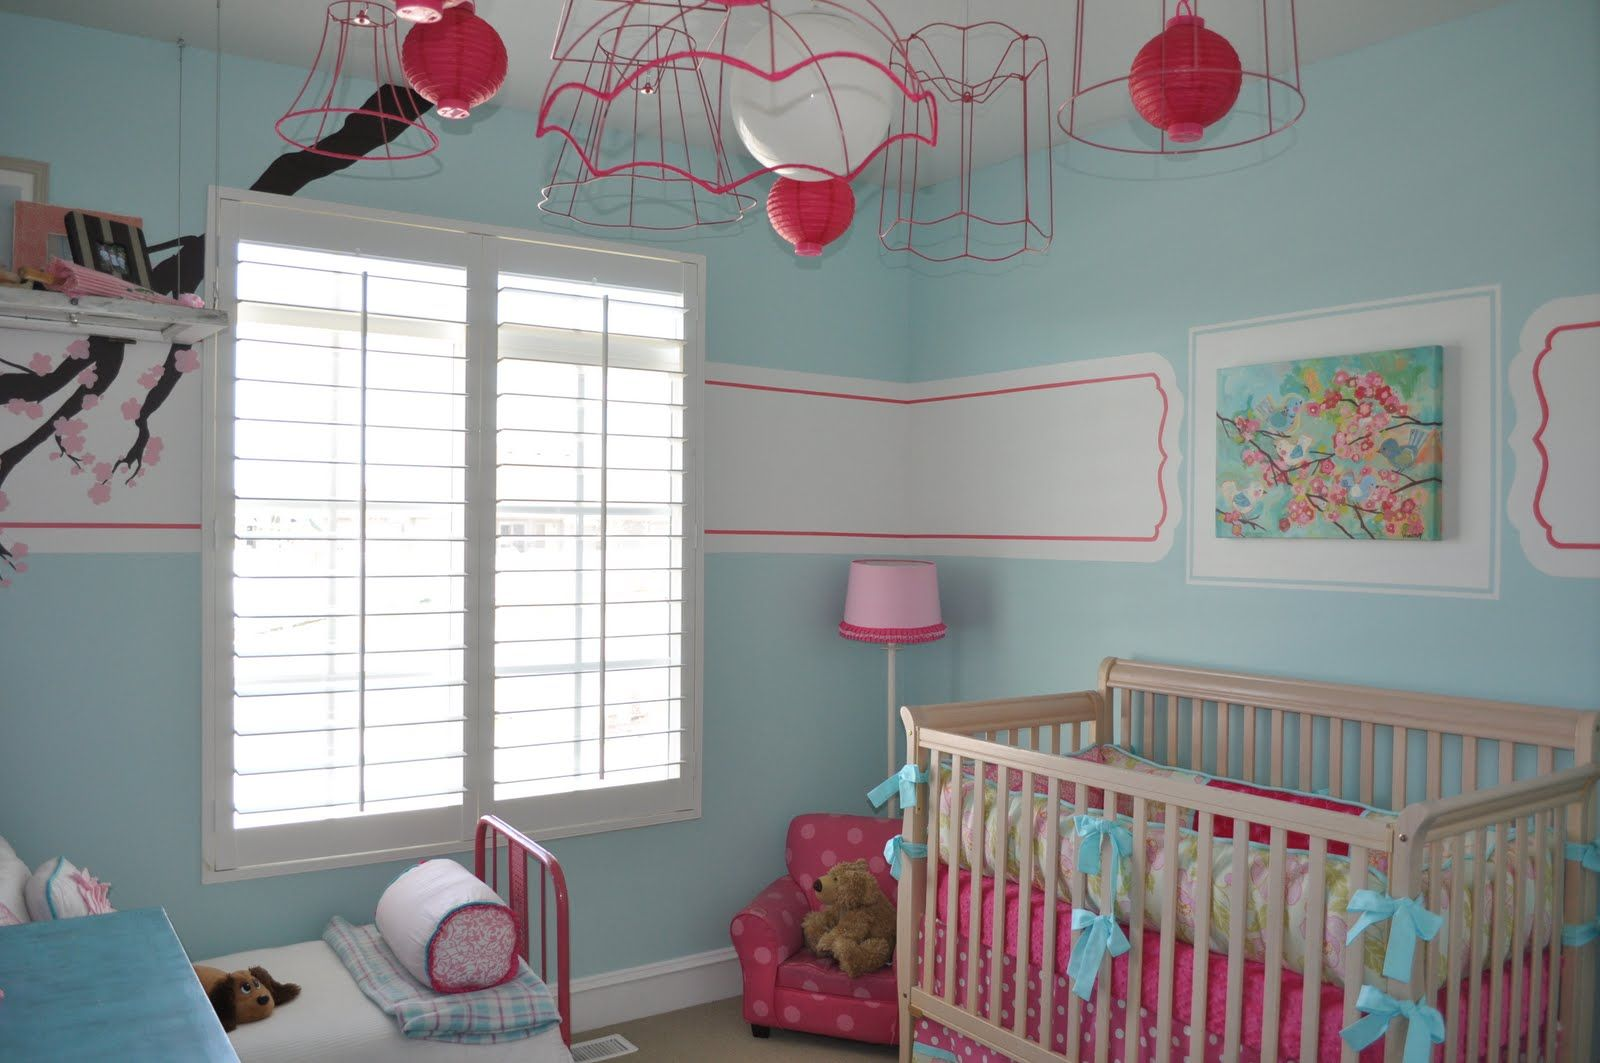 Baby Girl Room Decor Baby Girl Nursery Ideas I Like The White Sectionscan Do